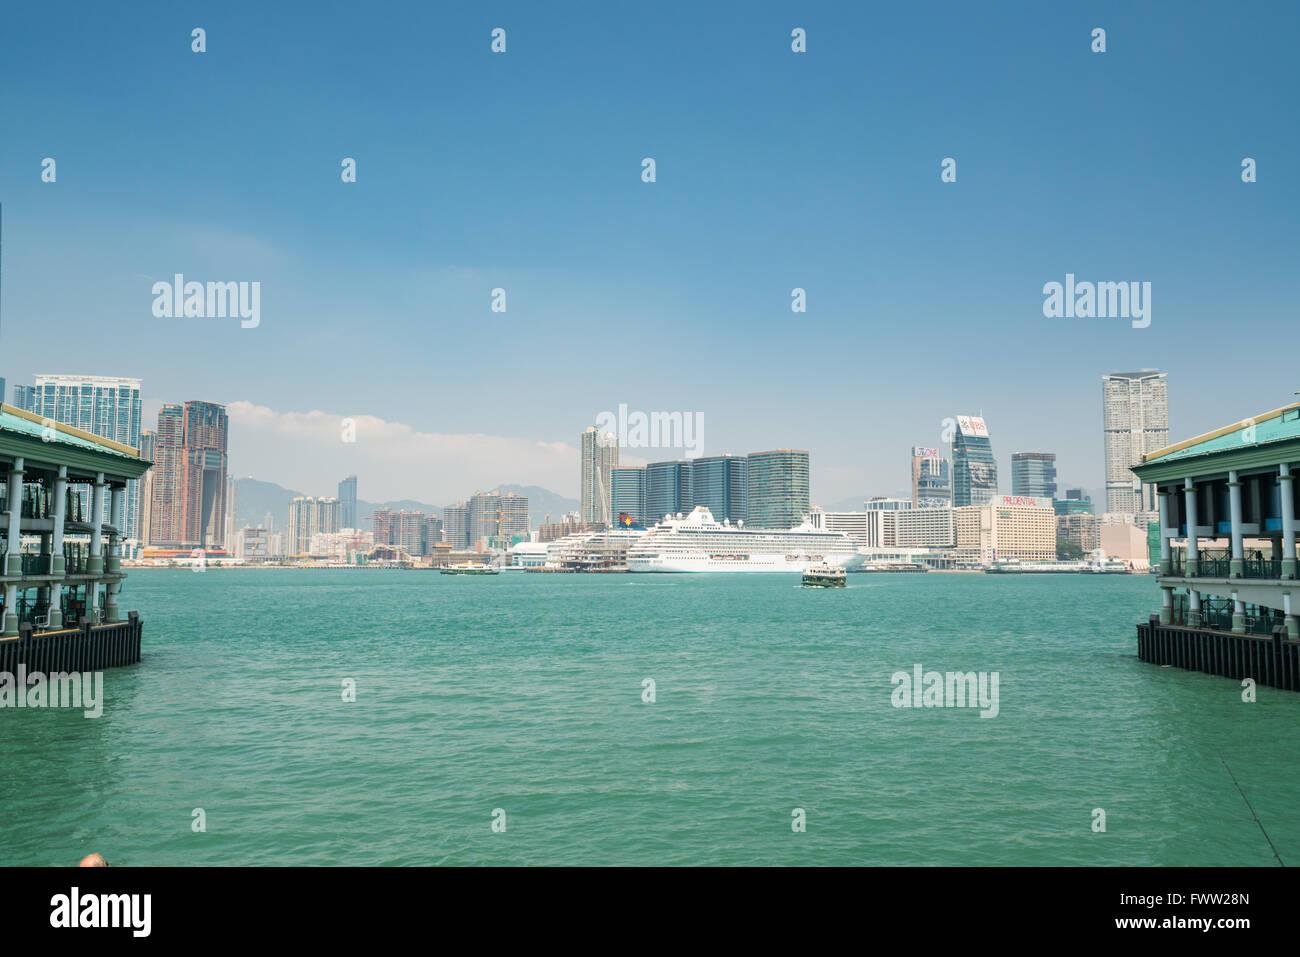 hongkong skyline - Stock Image